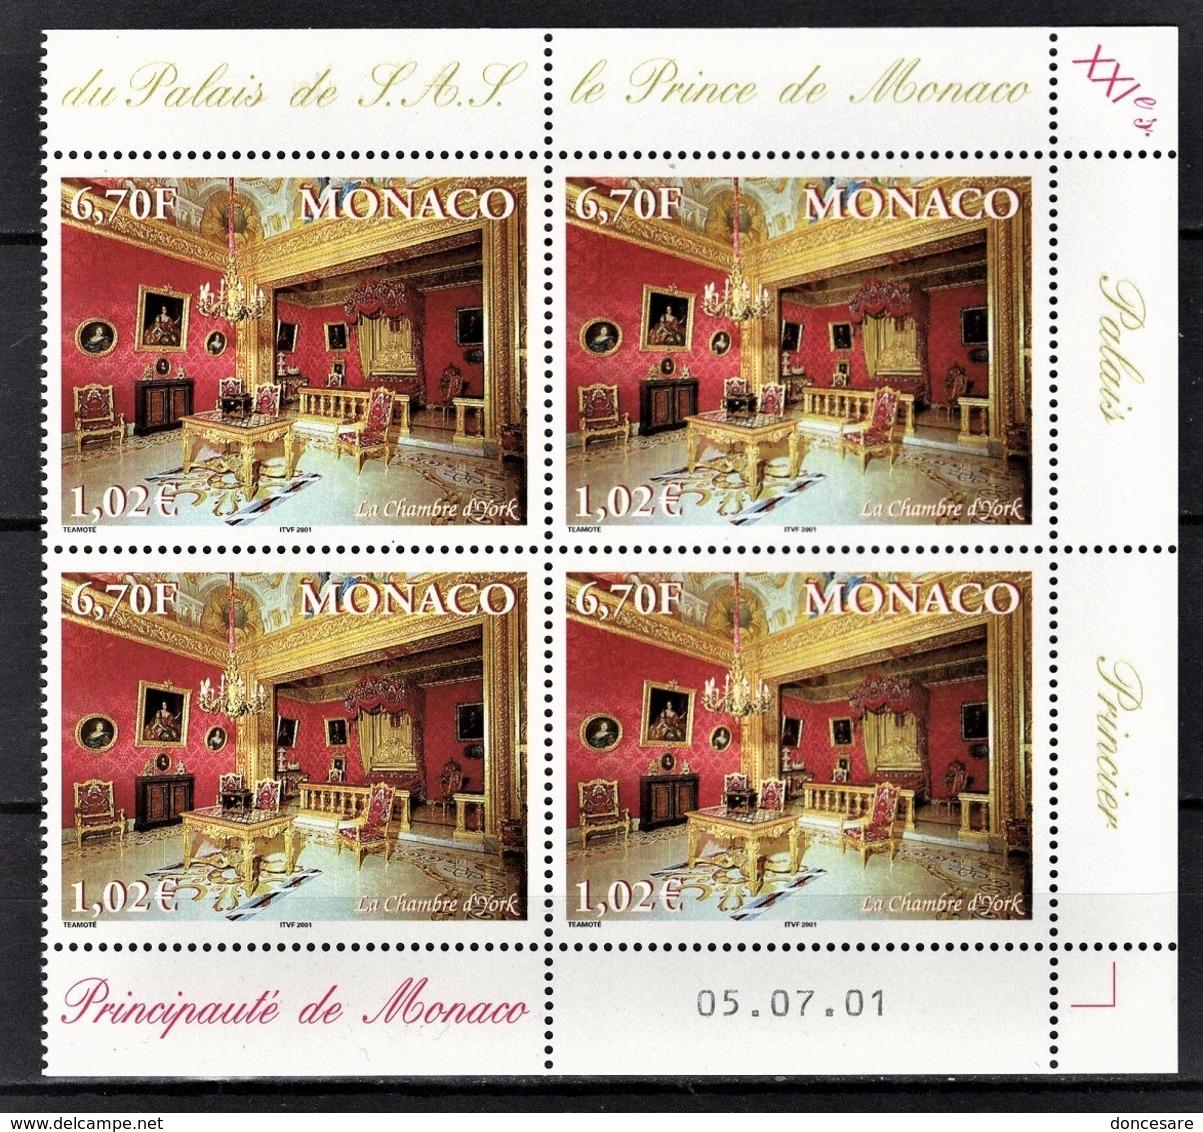 MONACO 2001 - BLOC DE 4 TP  N° 2312 - COIN DE FEUILLE / DATE / NEUFS** - Neufs